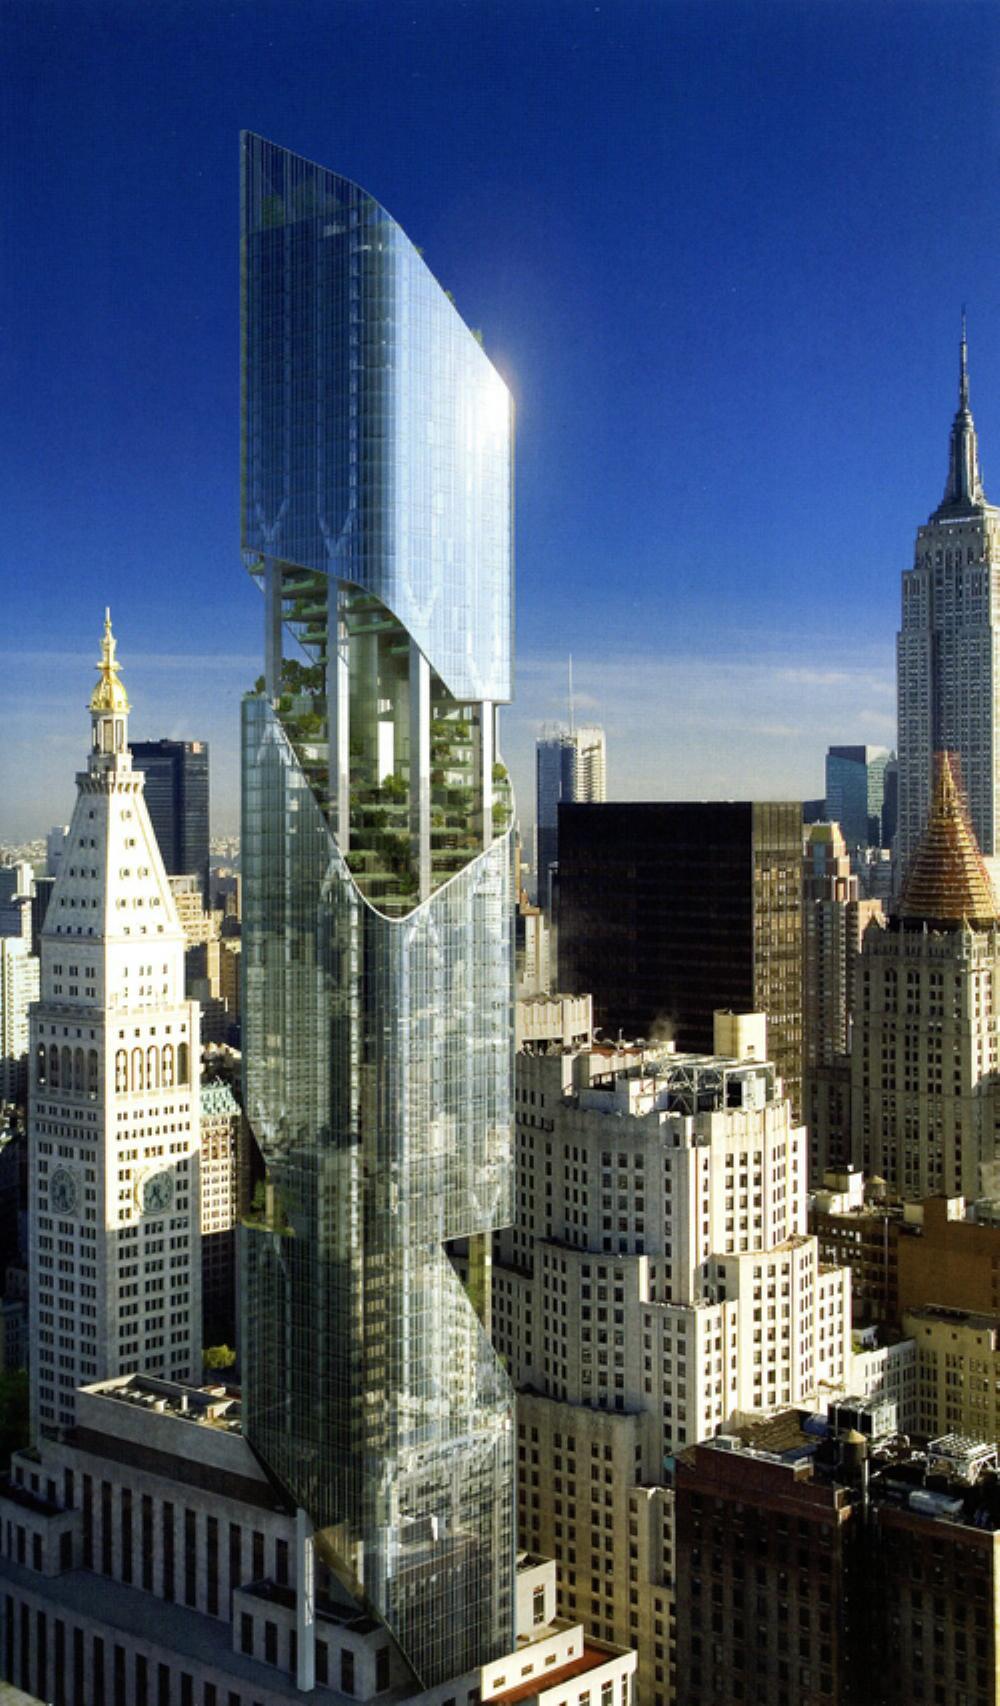 One Madison New York New York  One Madison Avenue  937 Ft  285.6 M  74 Floors